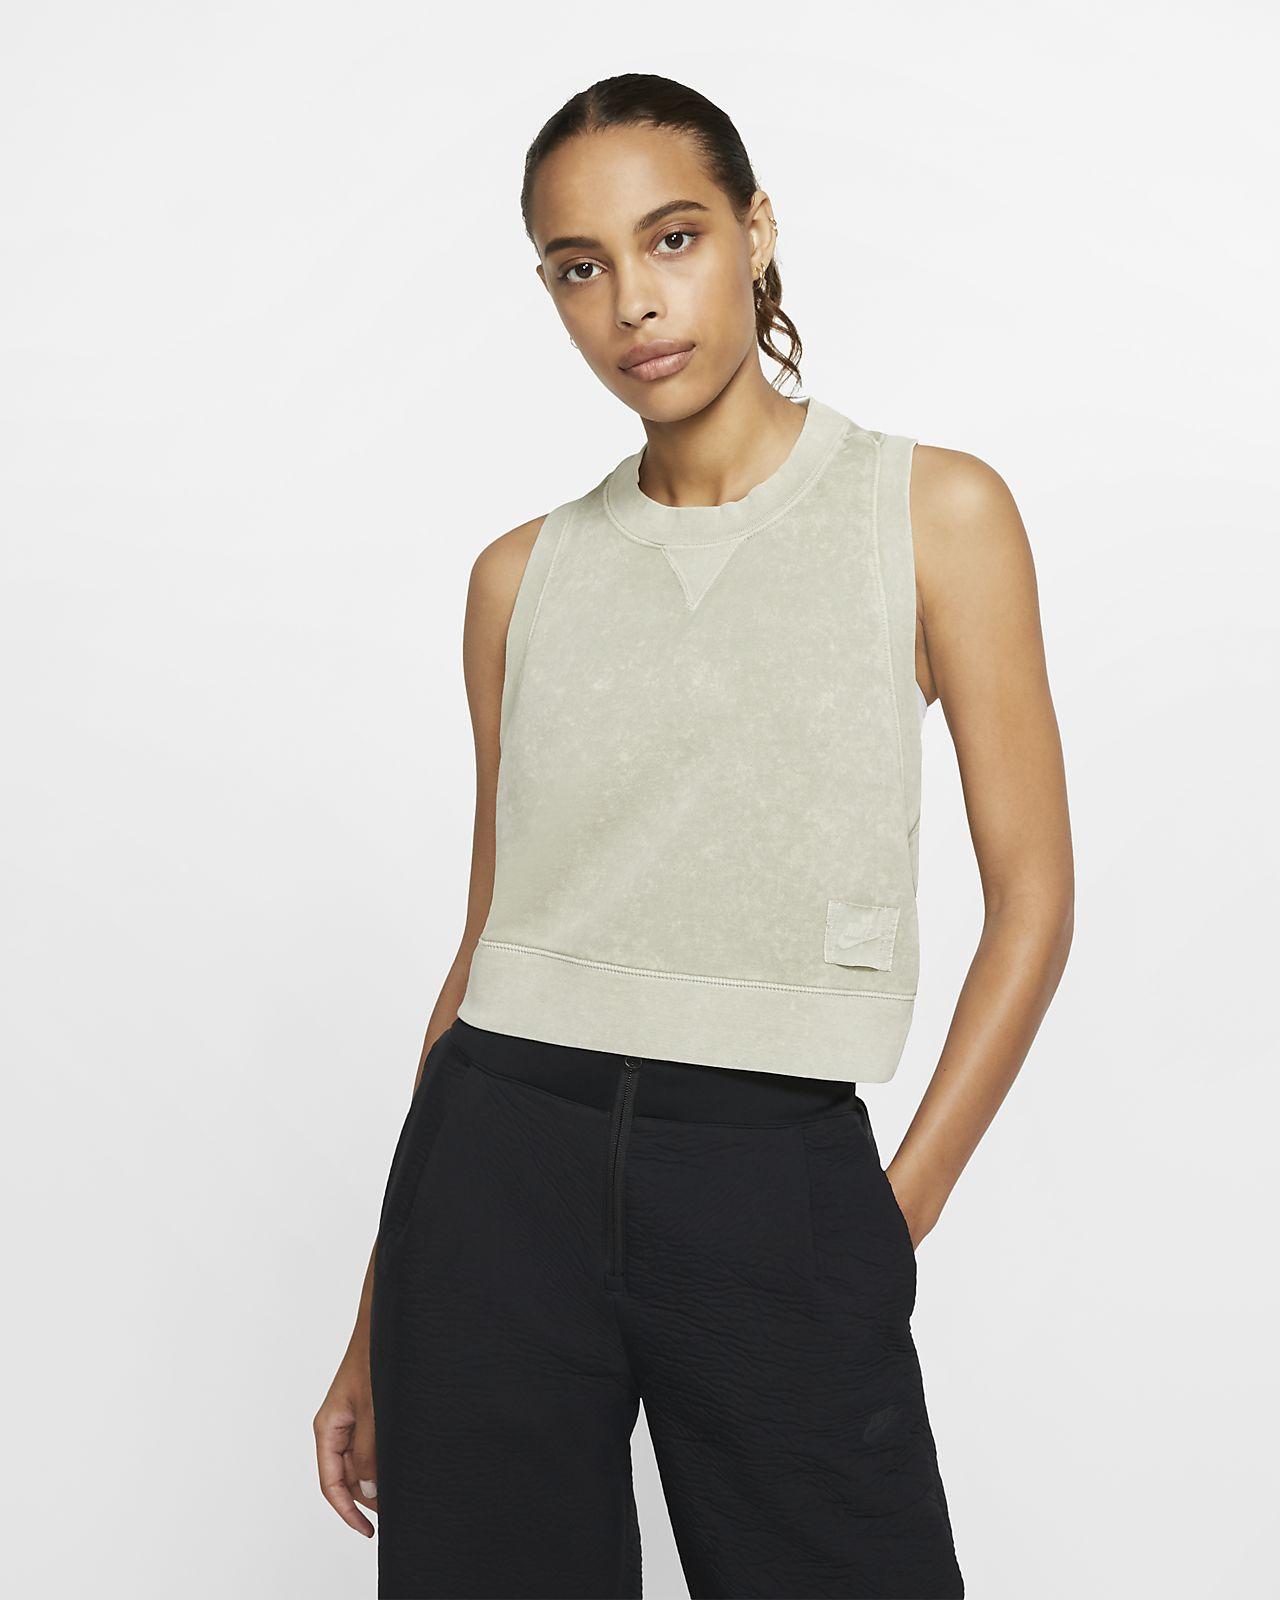 Nike Sportswear Camiseta de tirantes corta de tejido French terry - Mujer